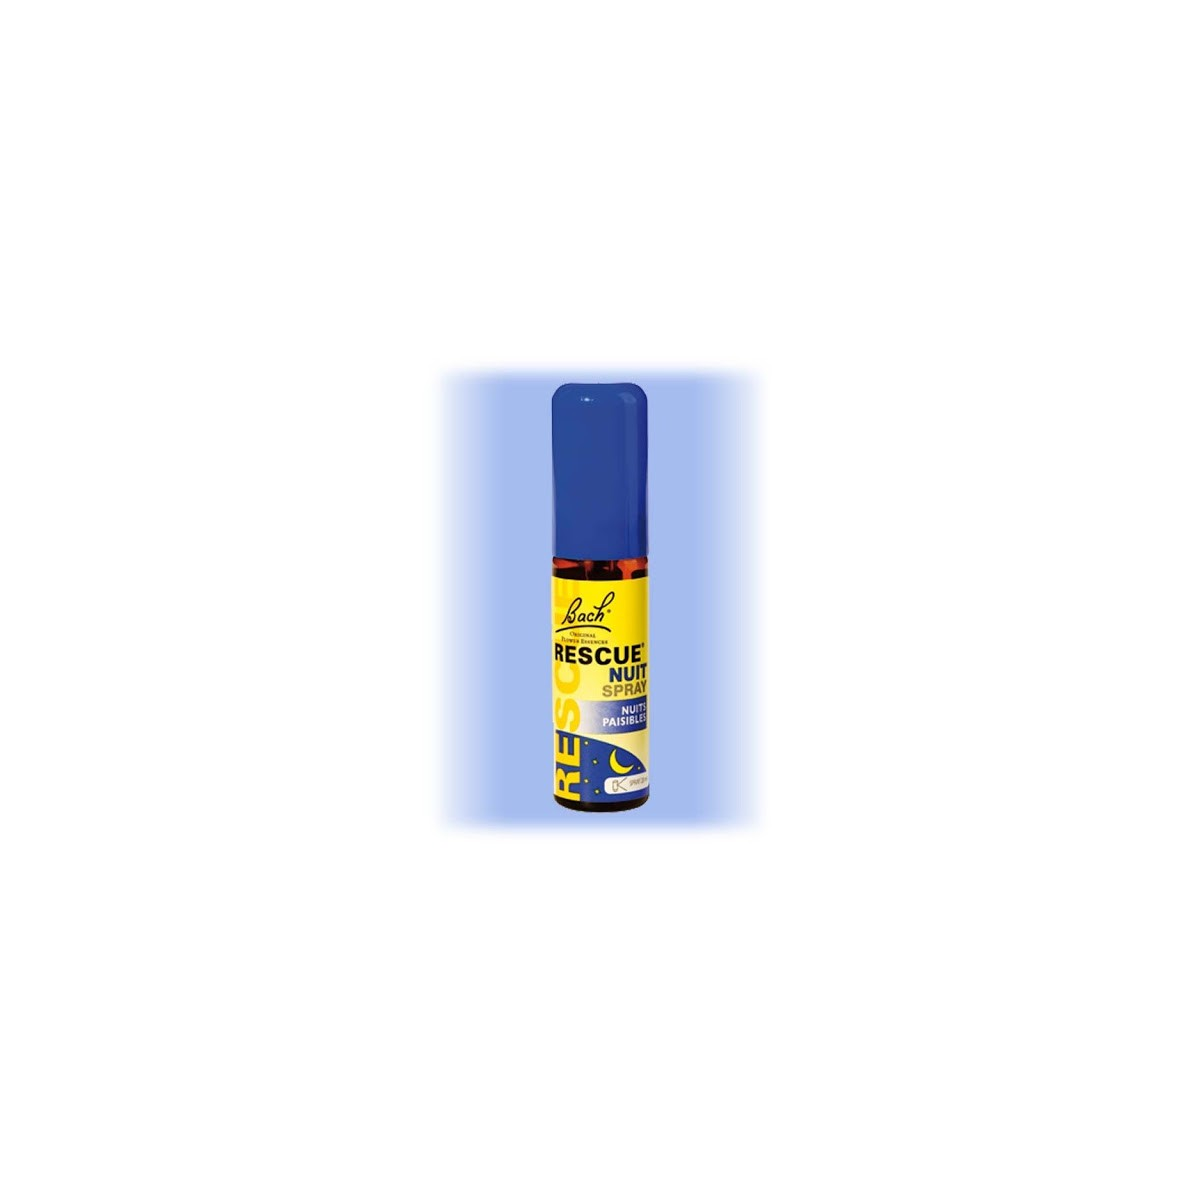 RESCUE NUIT Spray